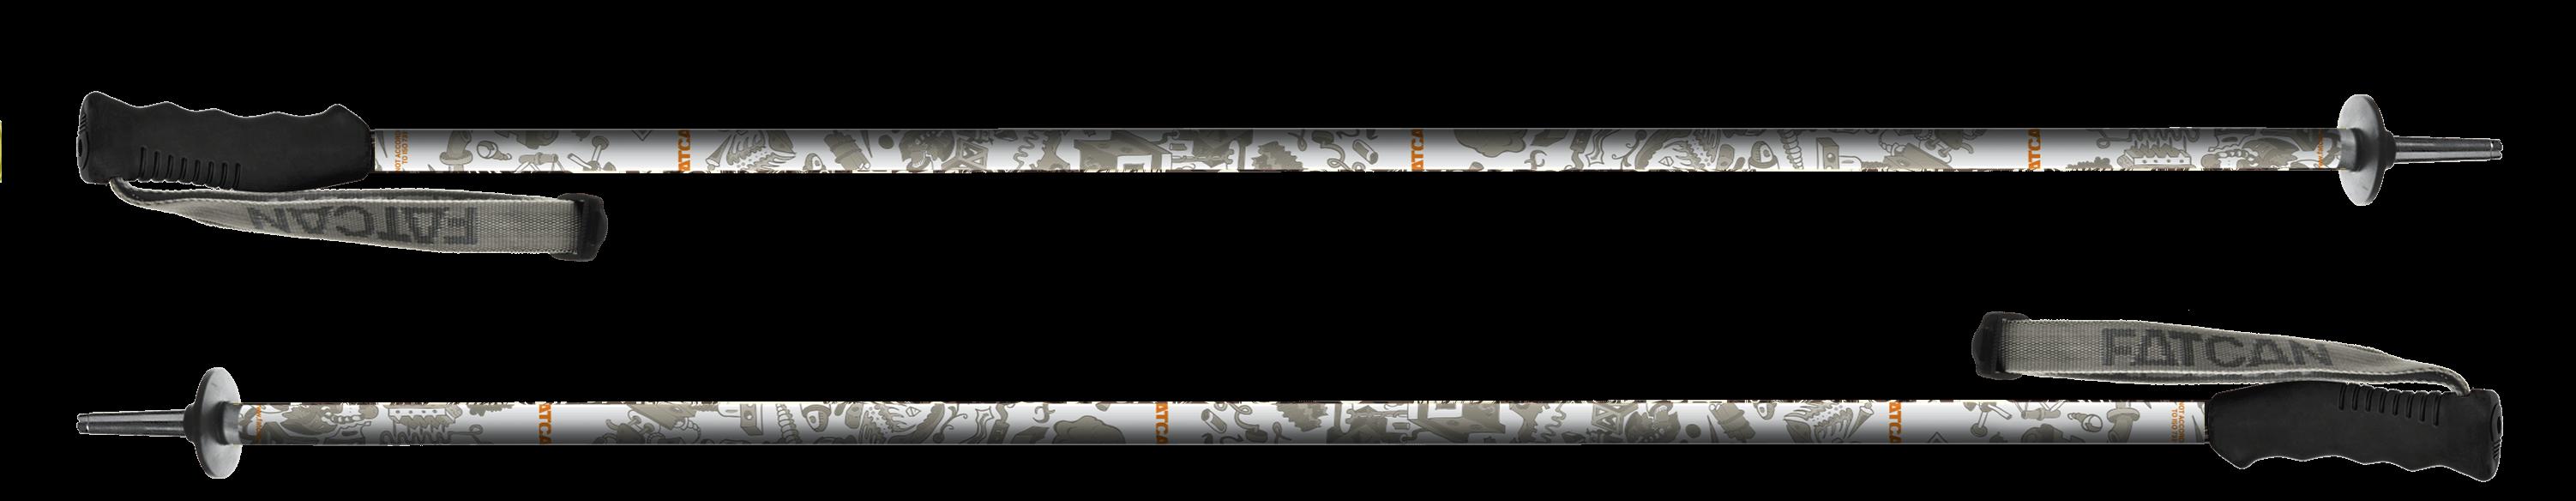 Comics 18 - Fatcan Ski Poles - made in Italy